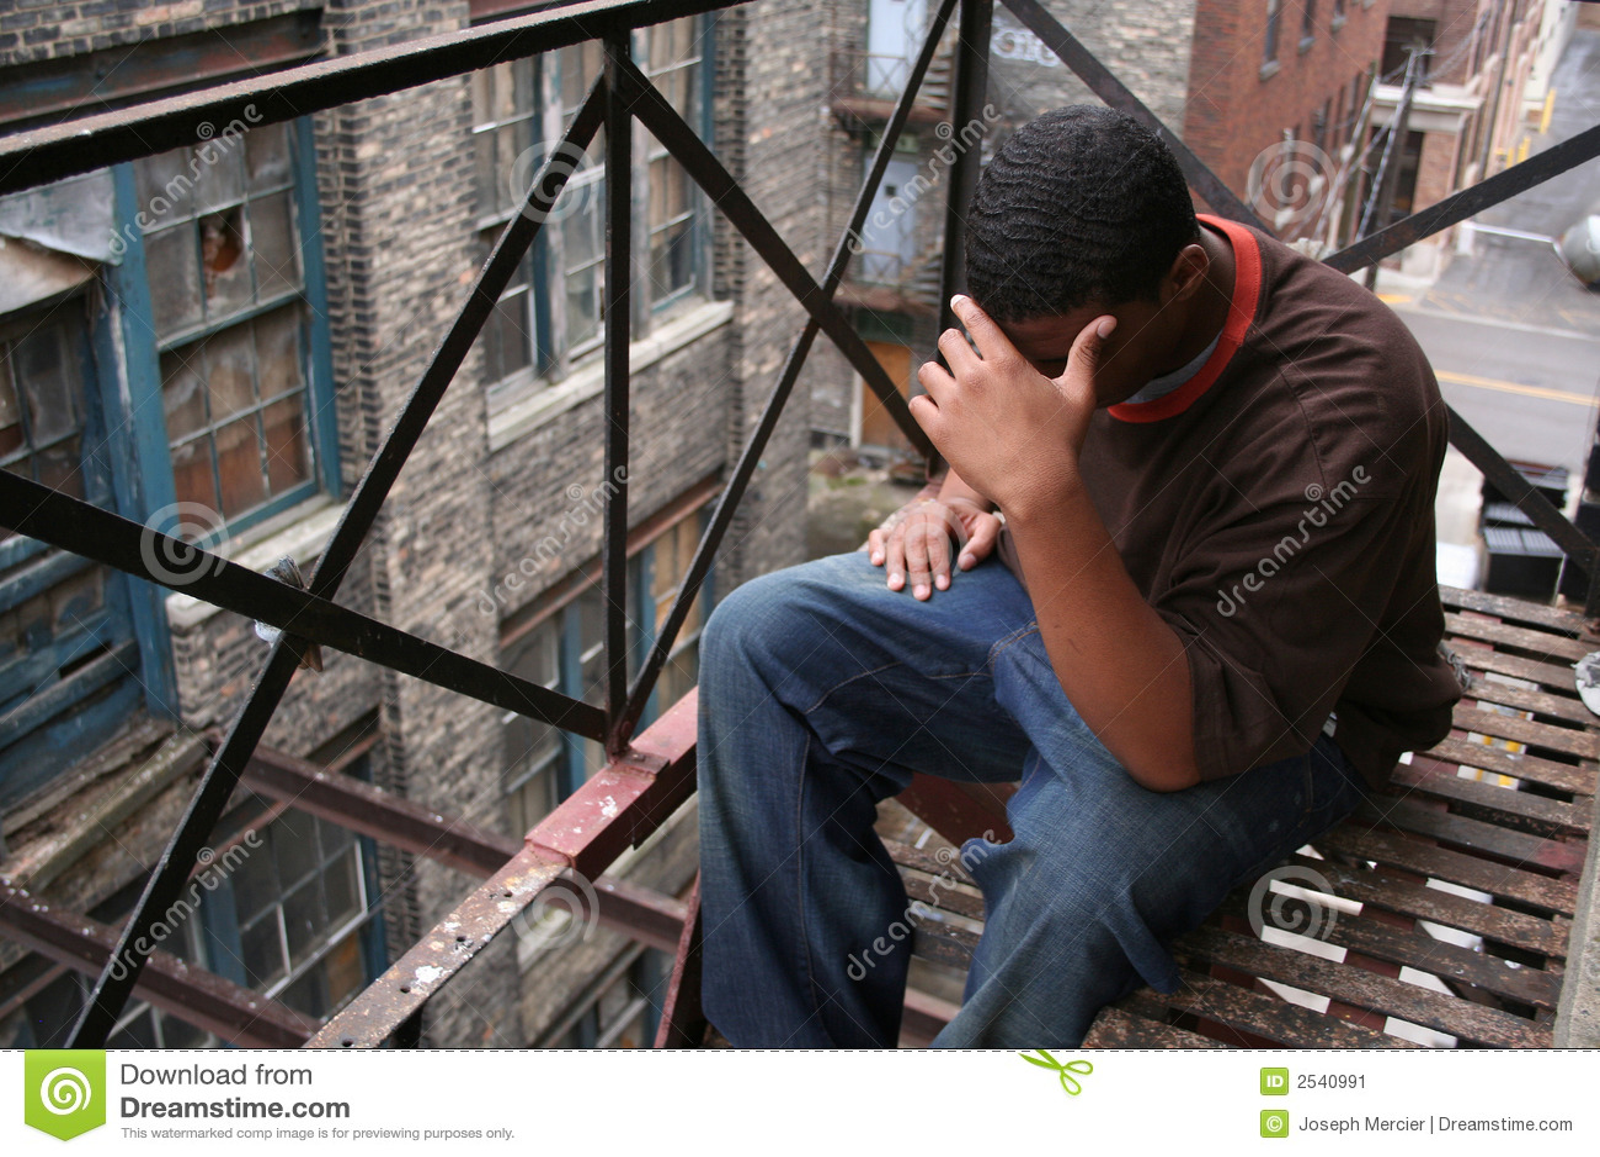 Upset Urban Teen Male